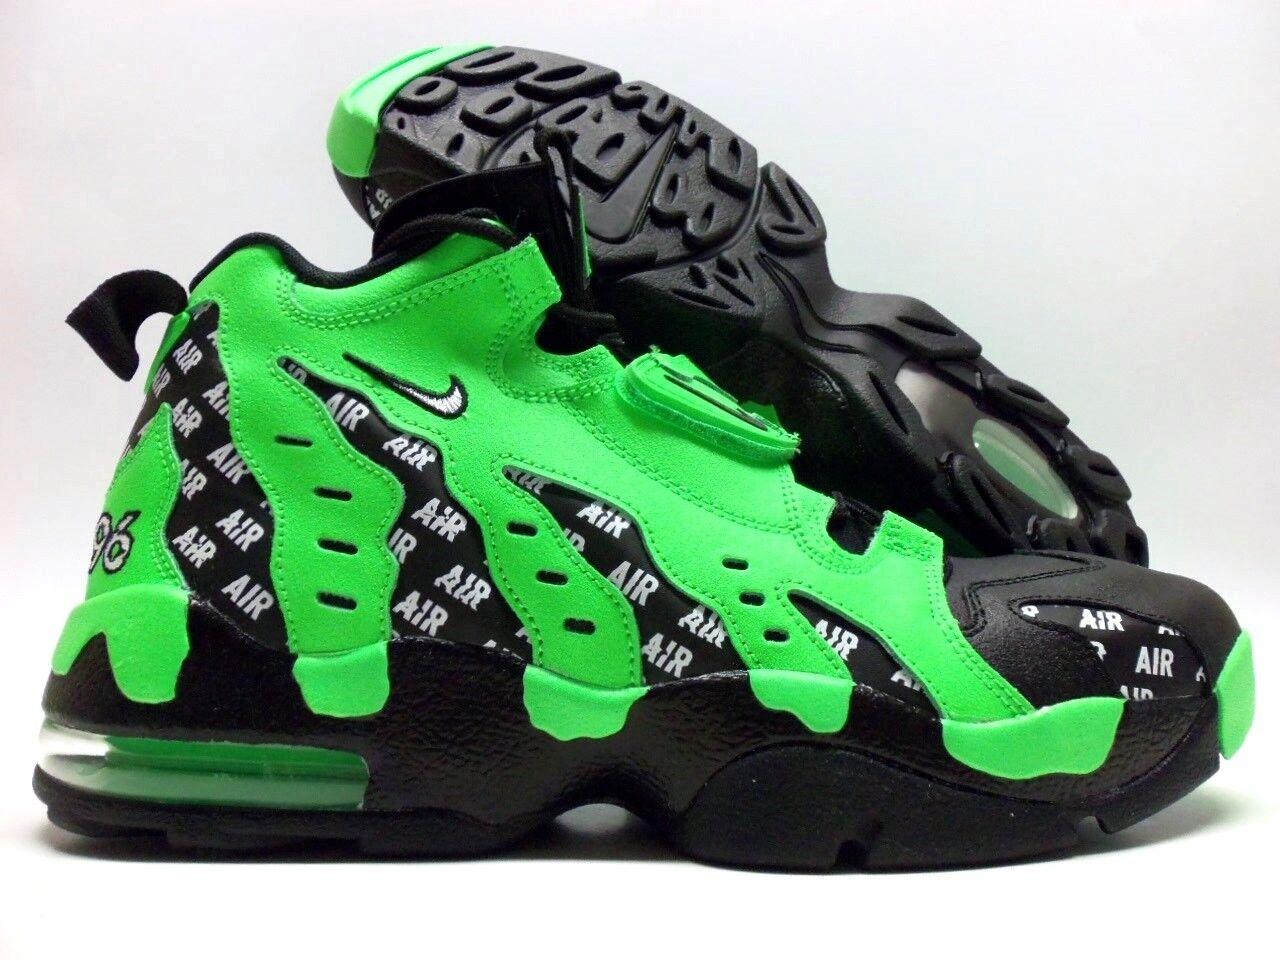 Nike air max '96 - wut grnen dt / / / schwarz-Weiß 11. aaf01a